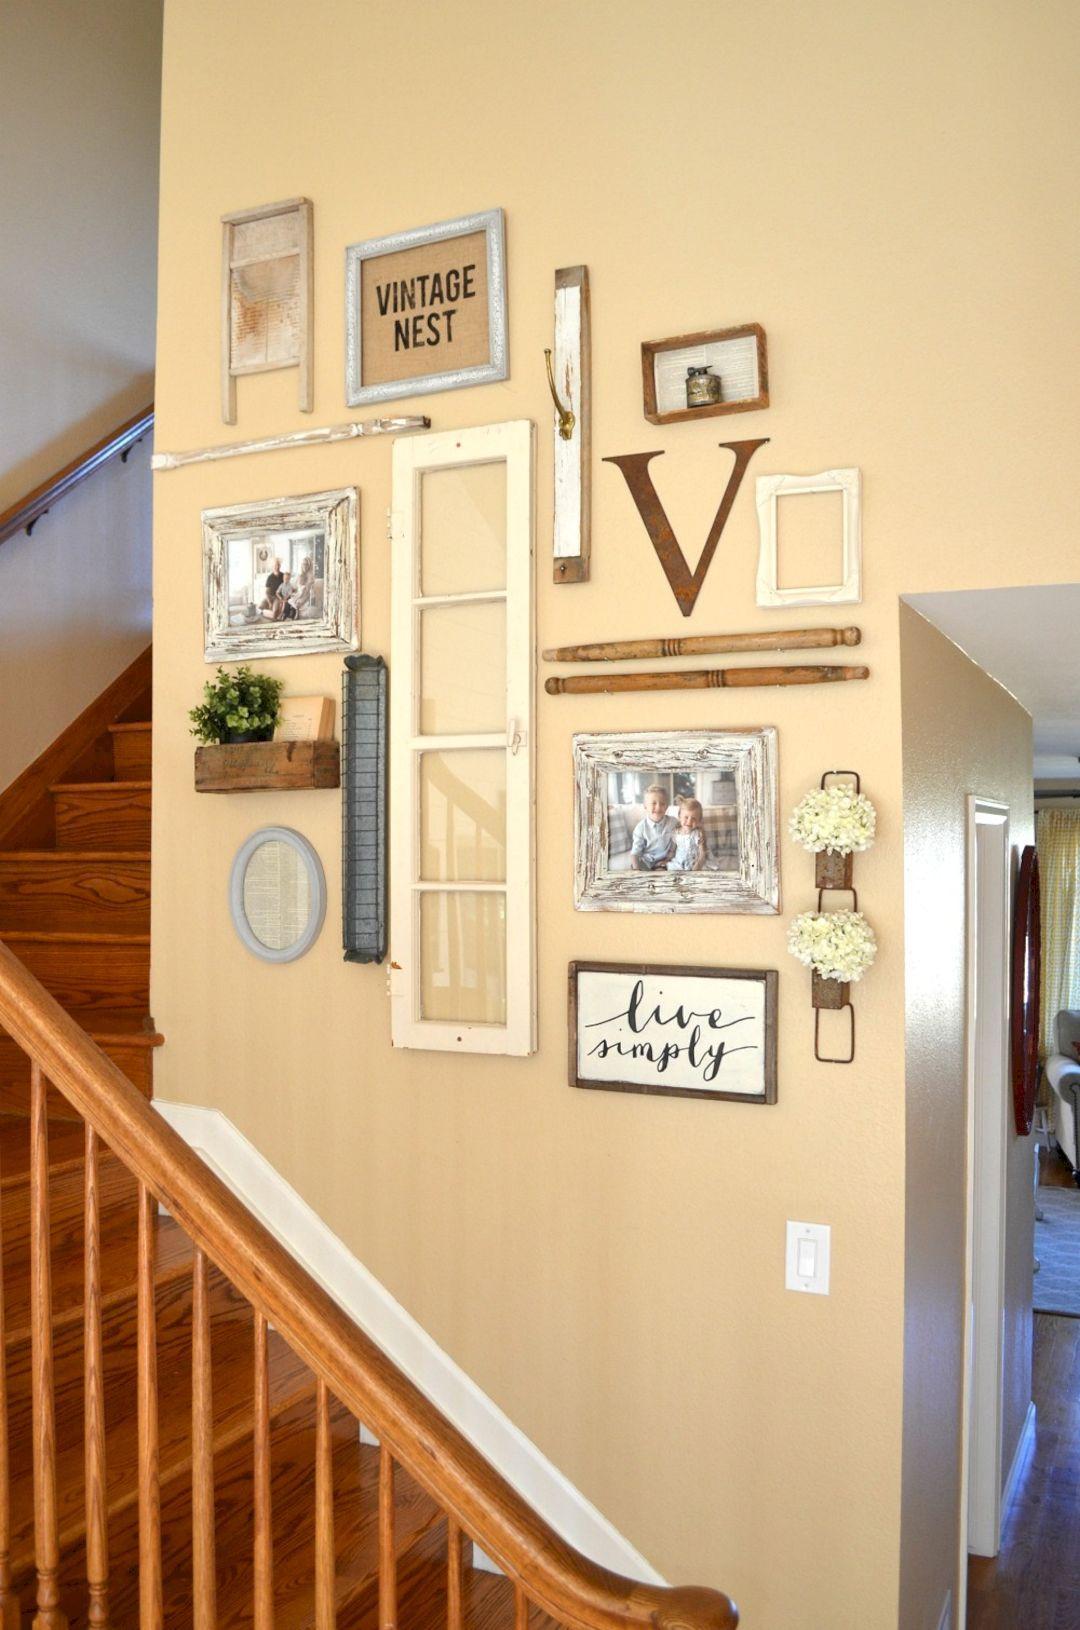 30 Wonderful Stairway Gallery Wall Ideas | Wall ideas, Gallery wall ...